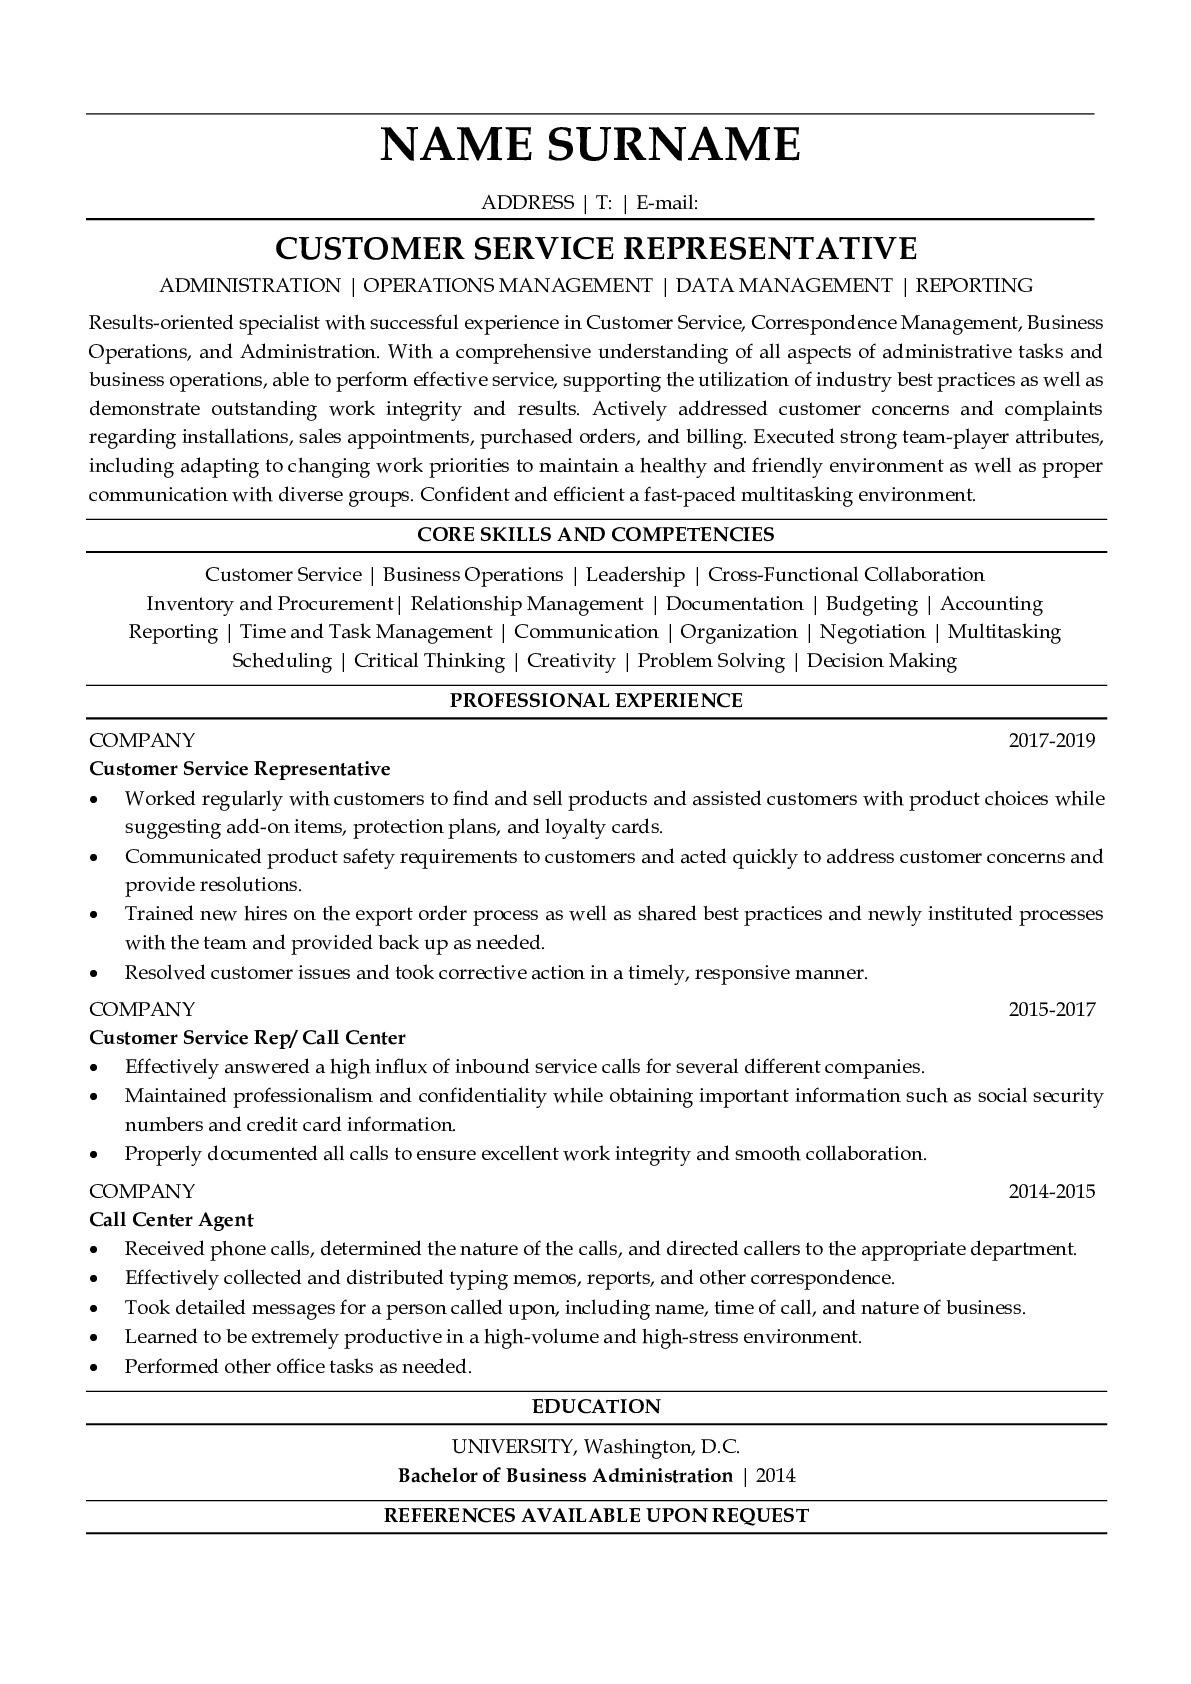 Resume Example for Customer Service Representative